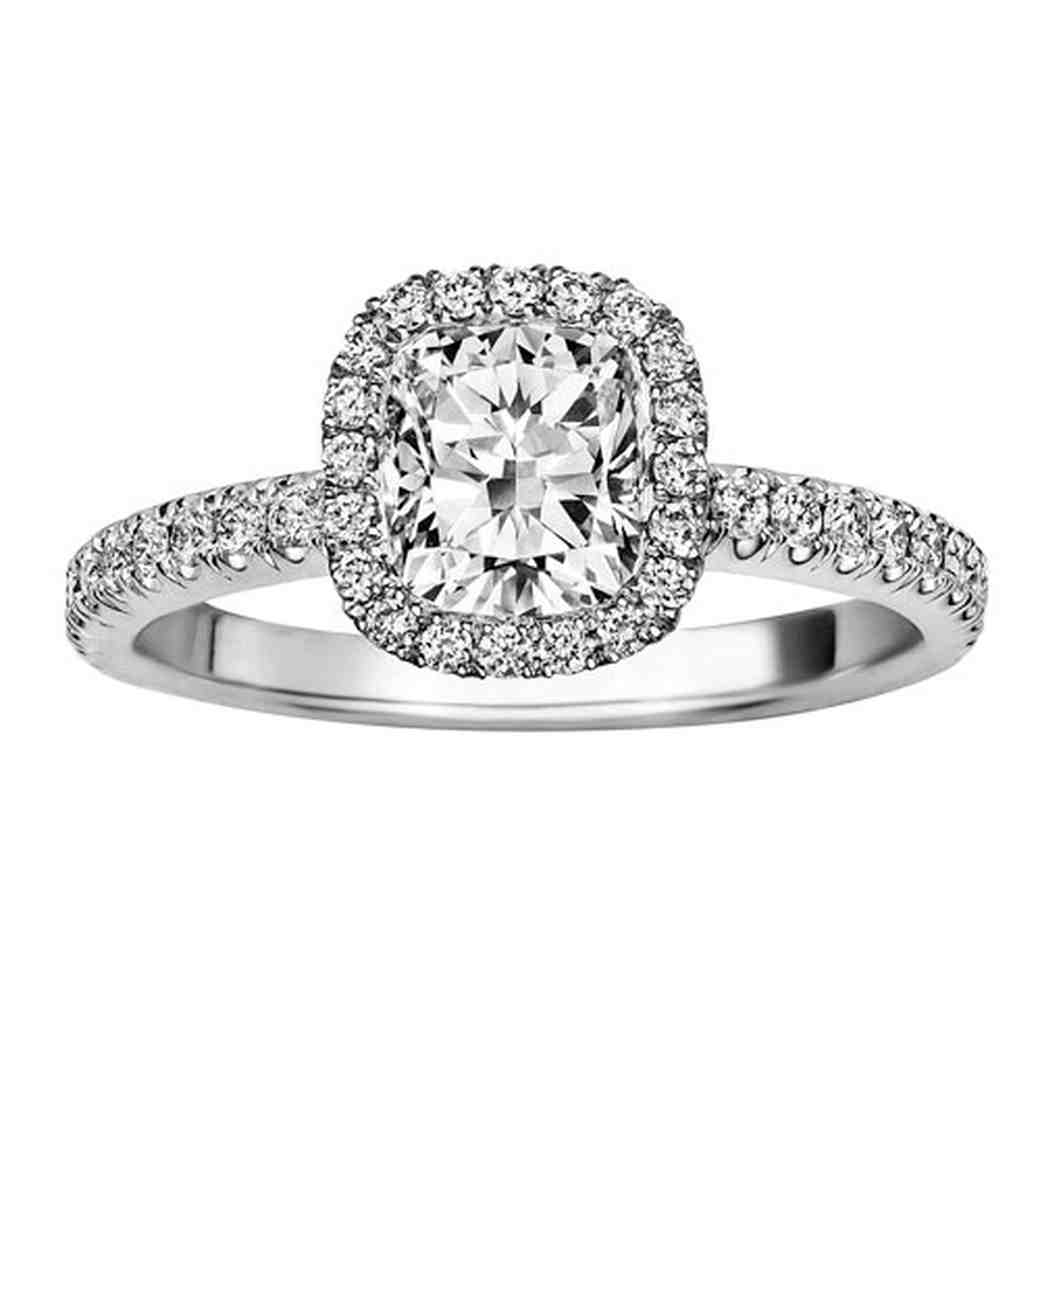 Cushion-Cut Diamond Engagement Rings